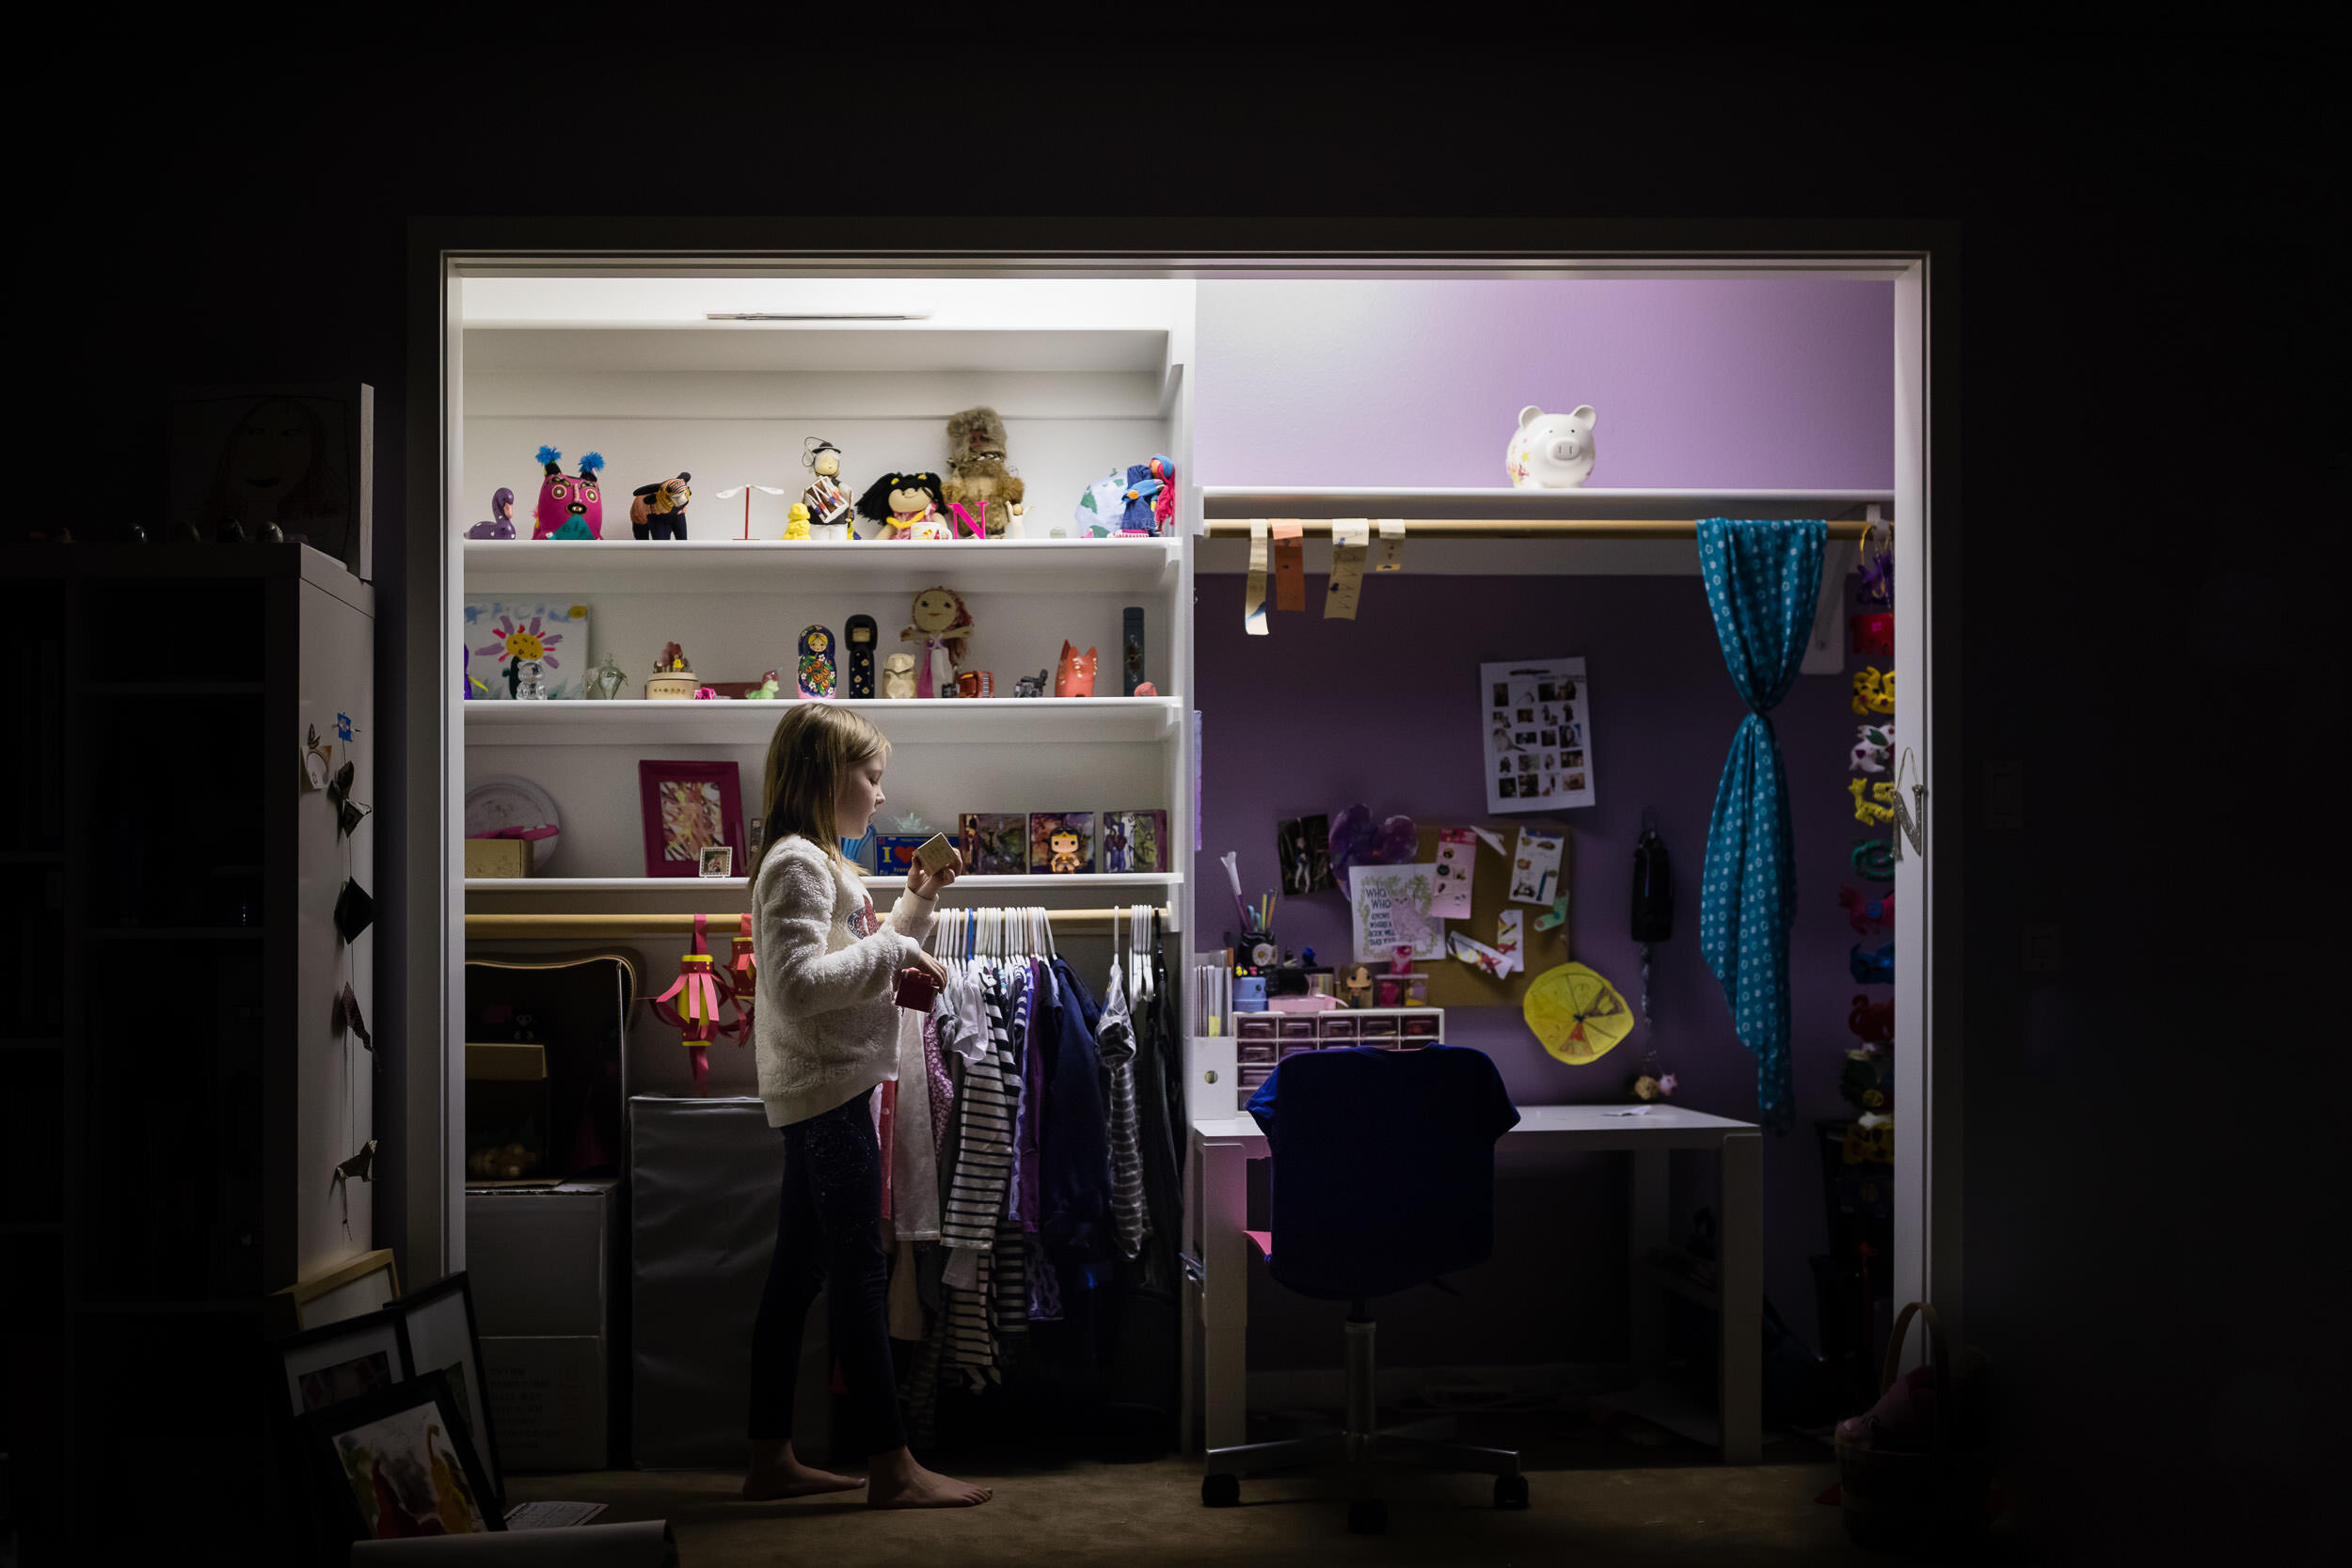 childrens-bedroom-In-Home-photography-portland-oregon-rebecca-hunnicutt-farren.jpg